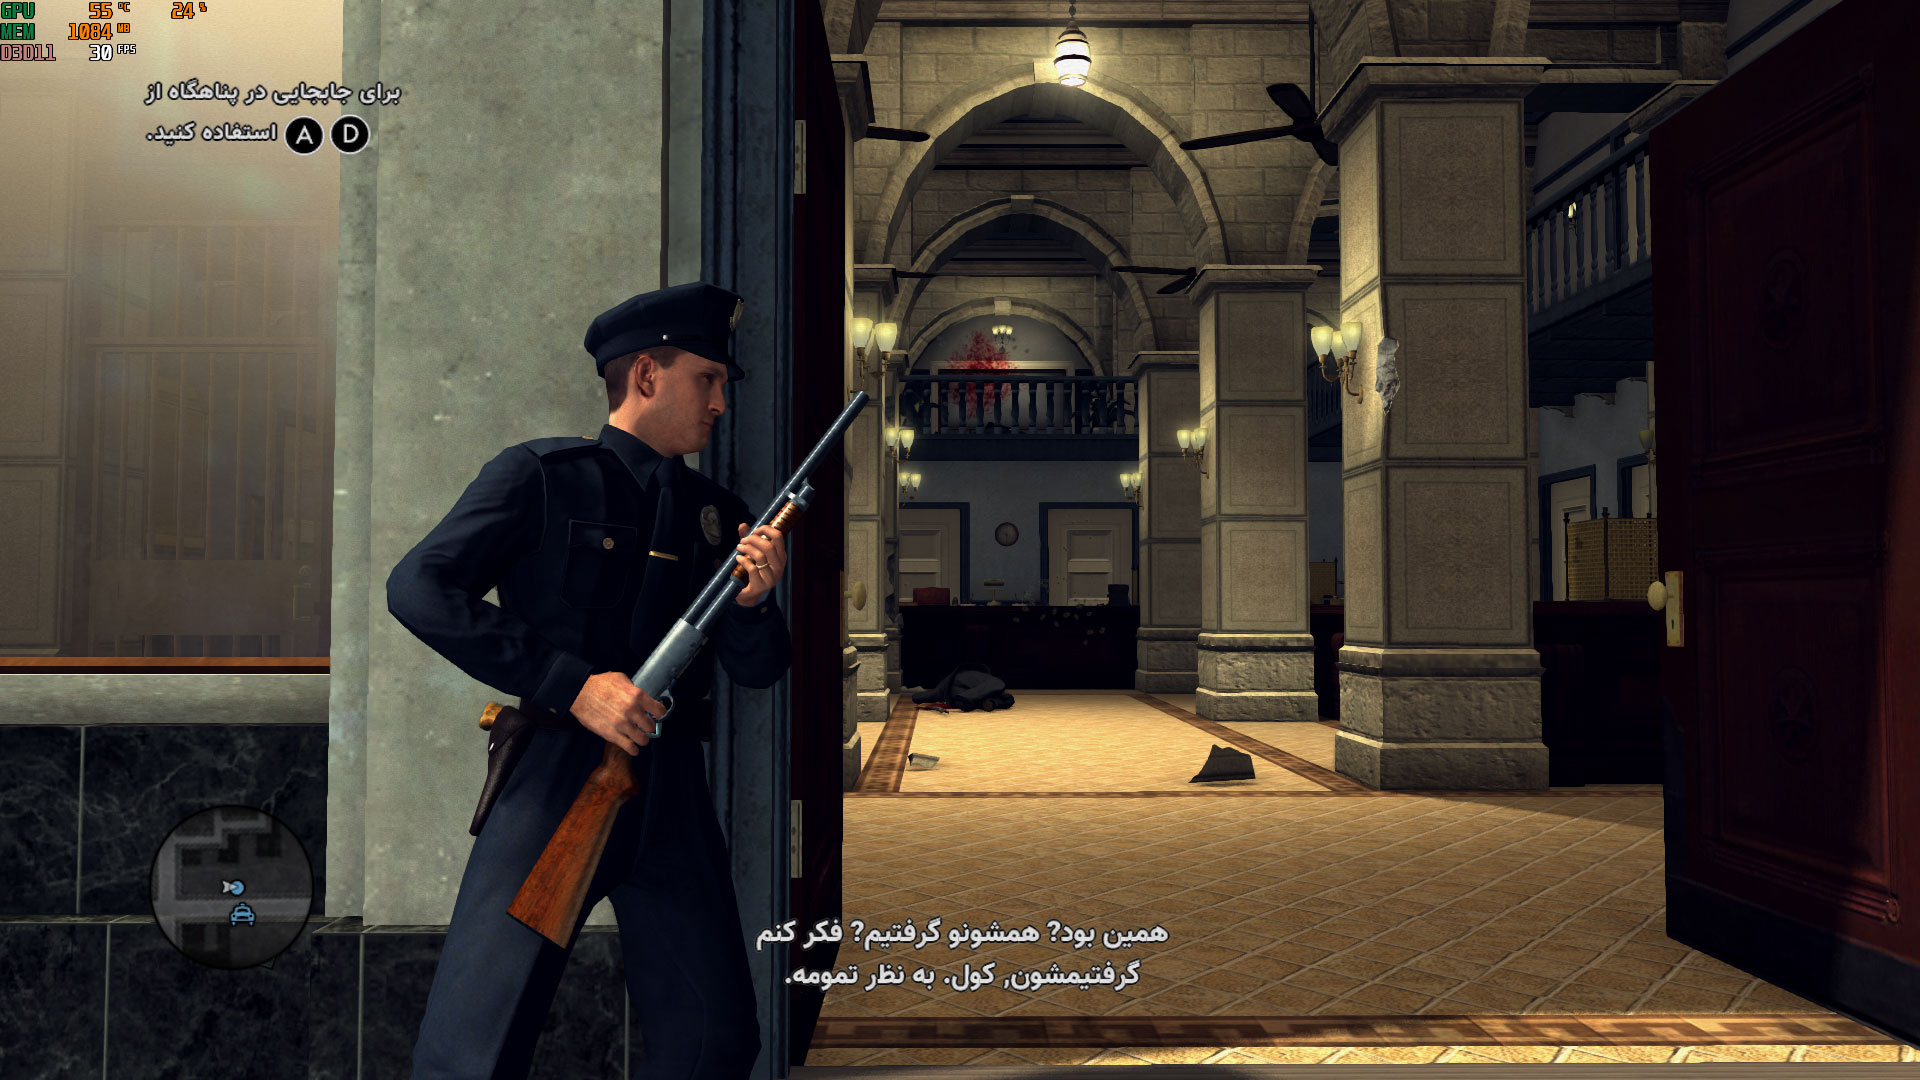 فارسی ساز بازی L.A. Noire